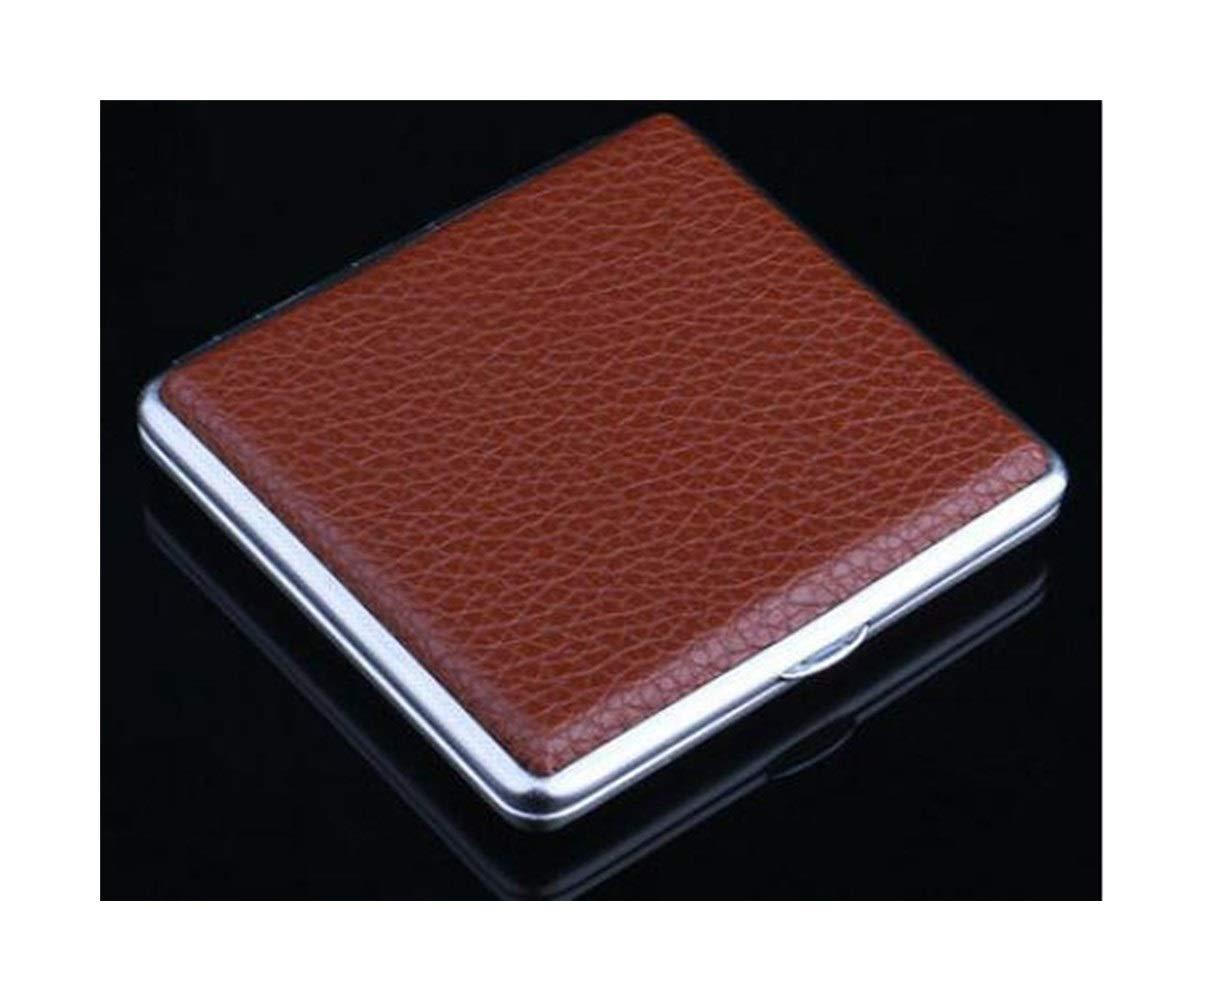 Jinfengtongxun Cigarette Box, Ultra-Thin Creative Simple Men's Cigarette Case 20 Sticks Portable Leather Cigarette Case Metal Cigarette Holder, Personalized Gift, Black (2 Packs)